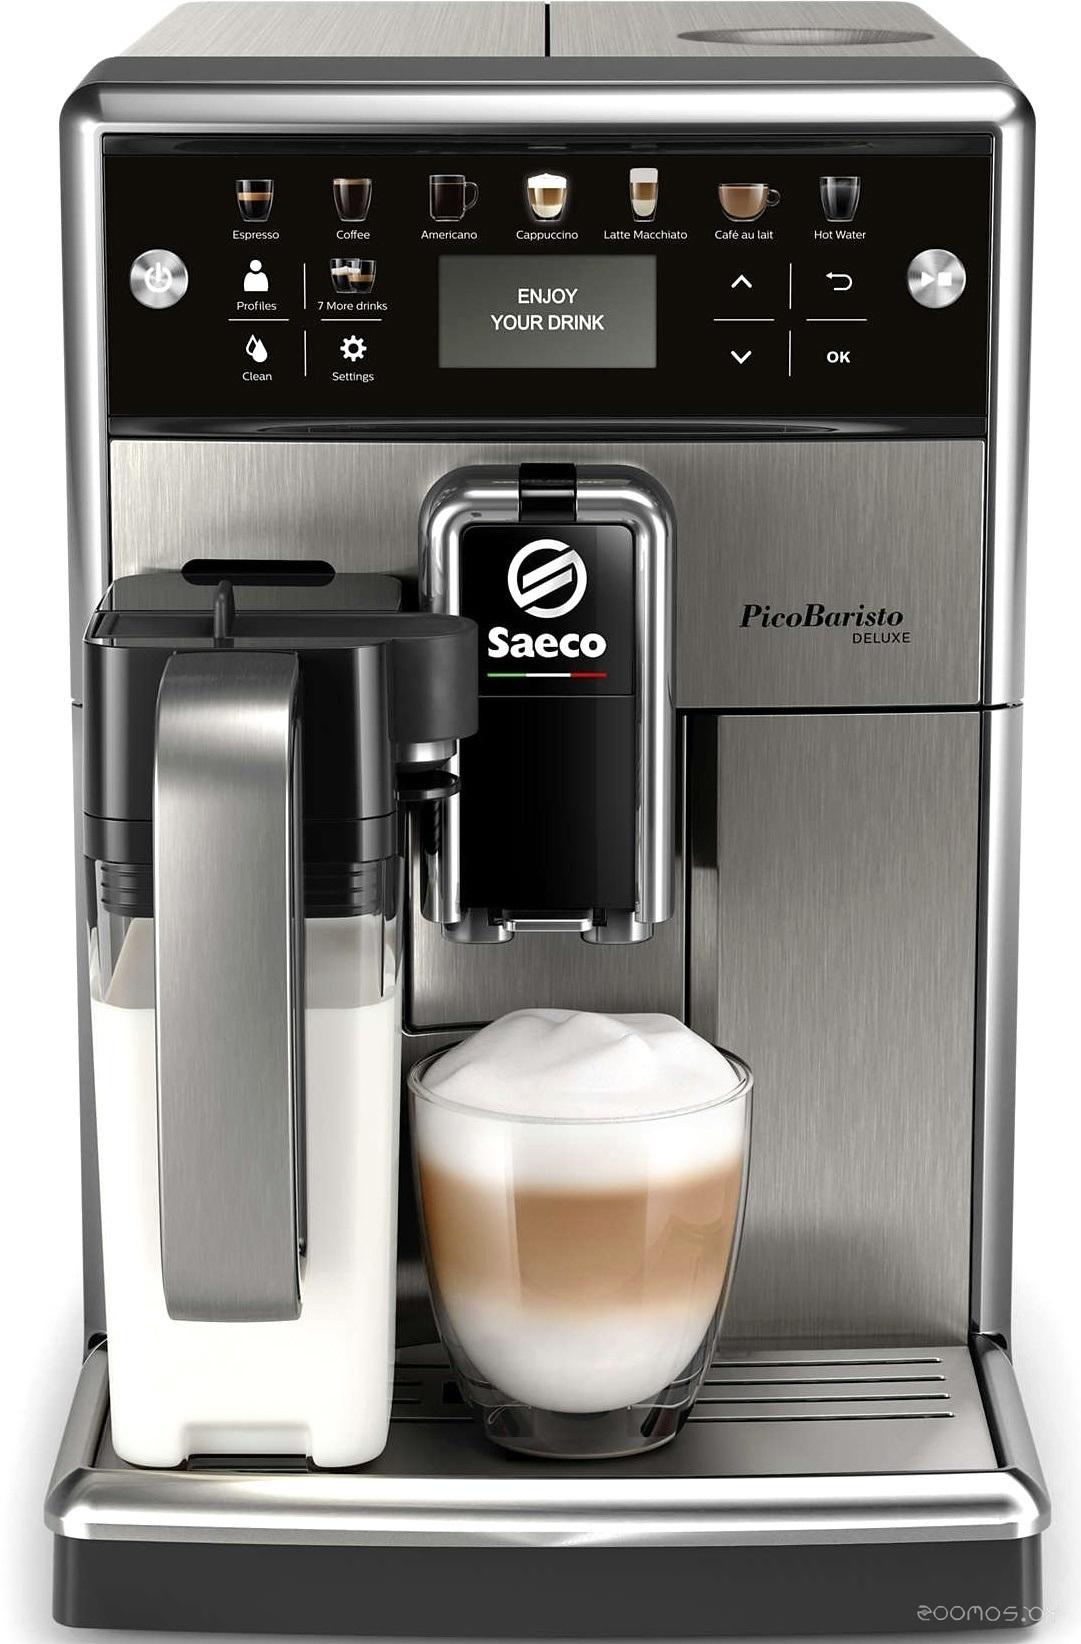 Saeco PicoBaristo Deluxe SM5573